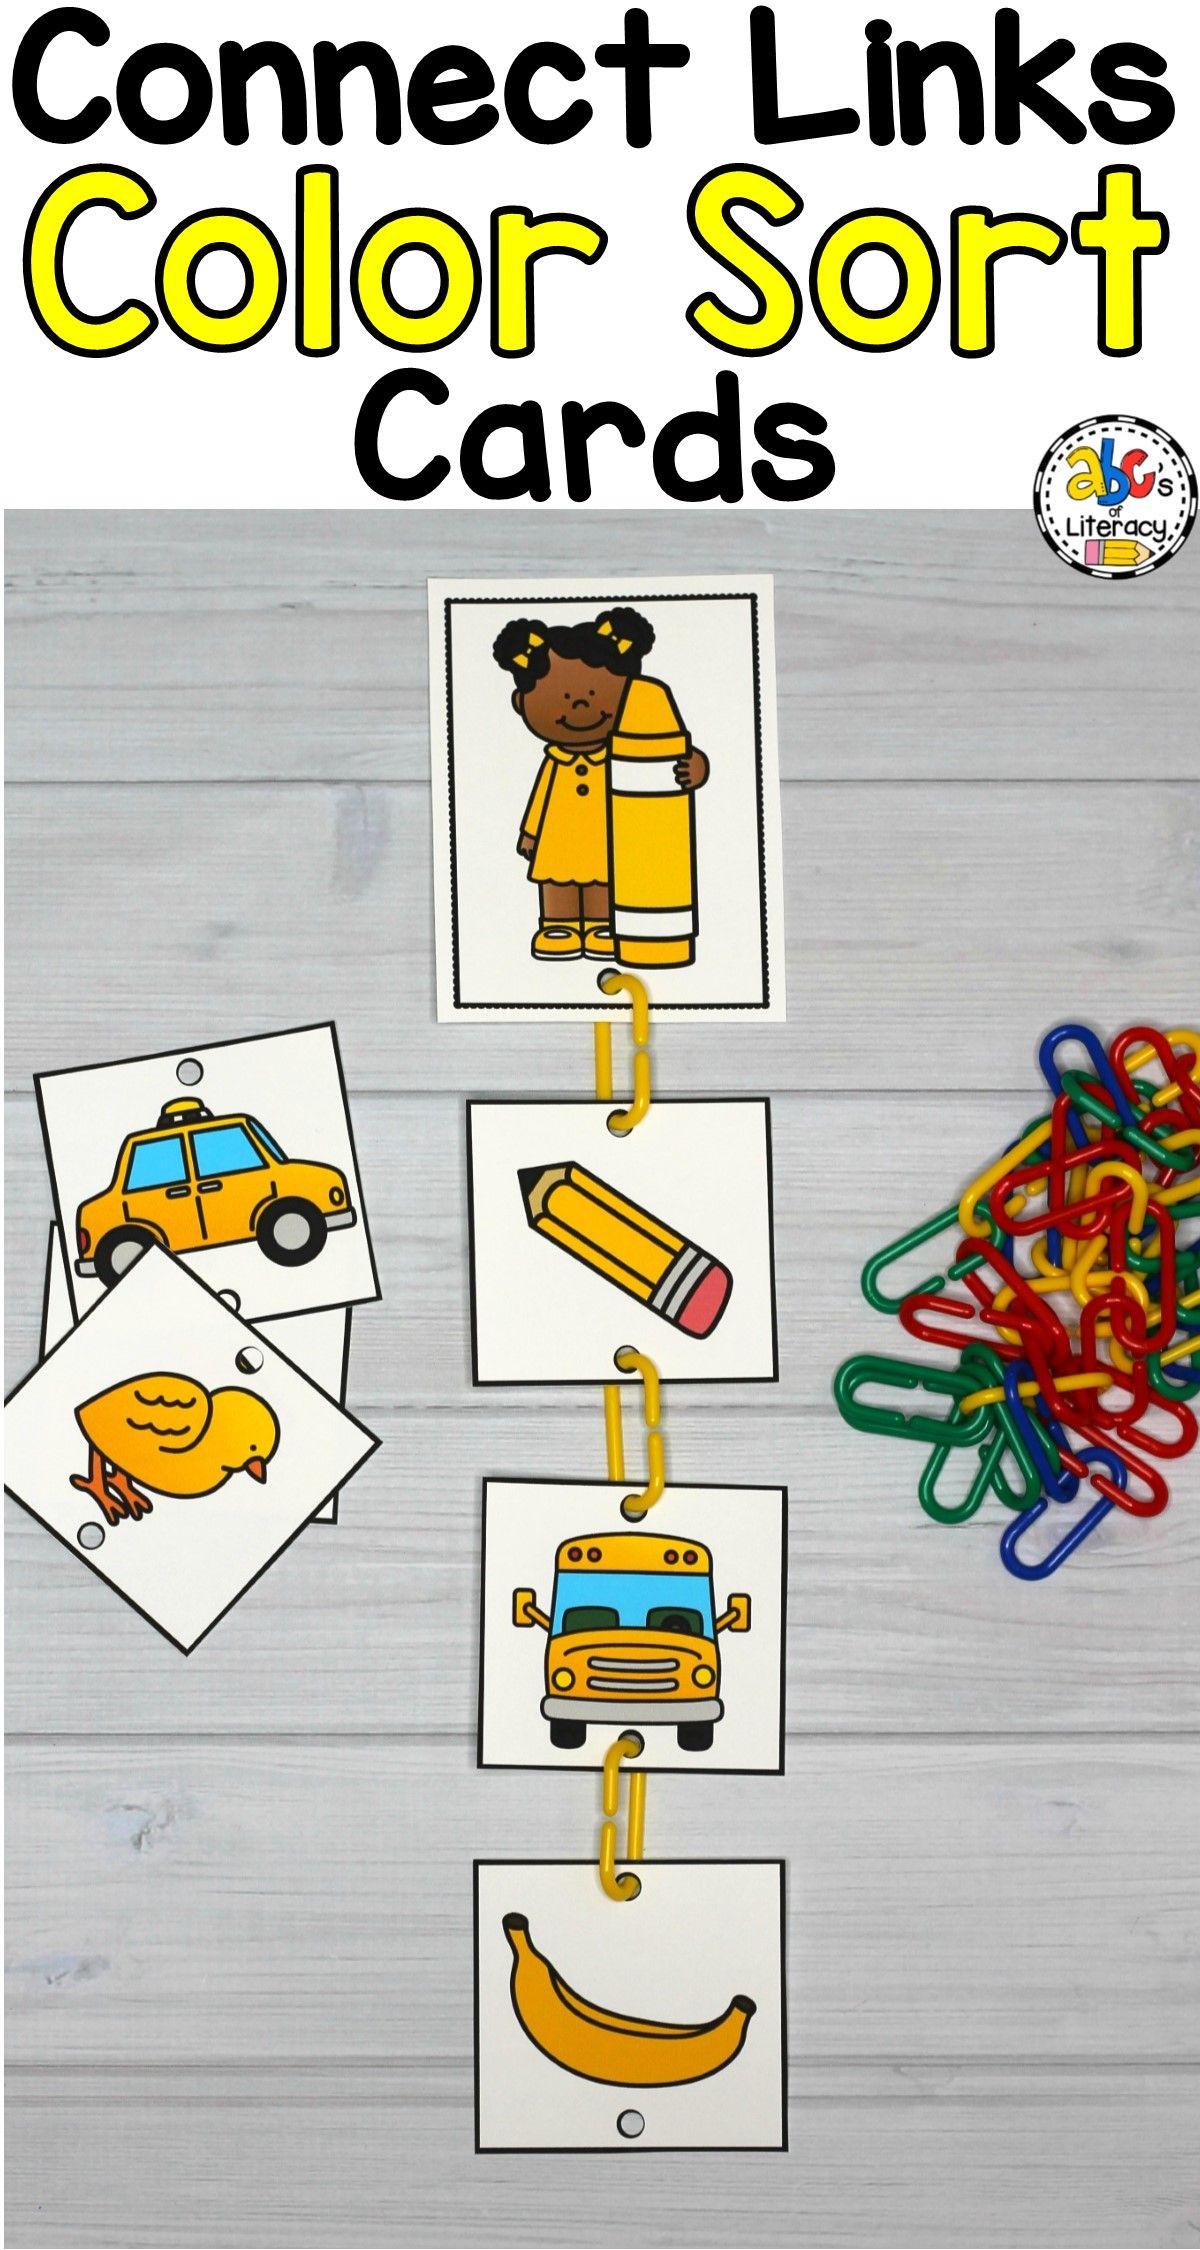 Connect Links Color Sort Task Cards